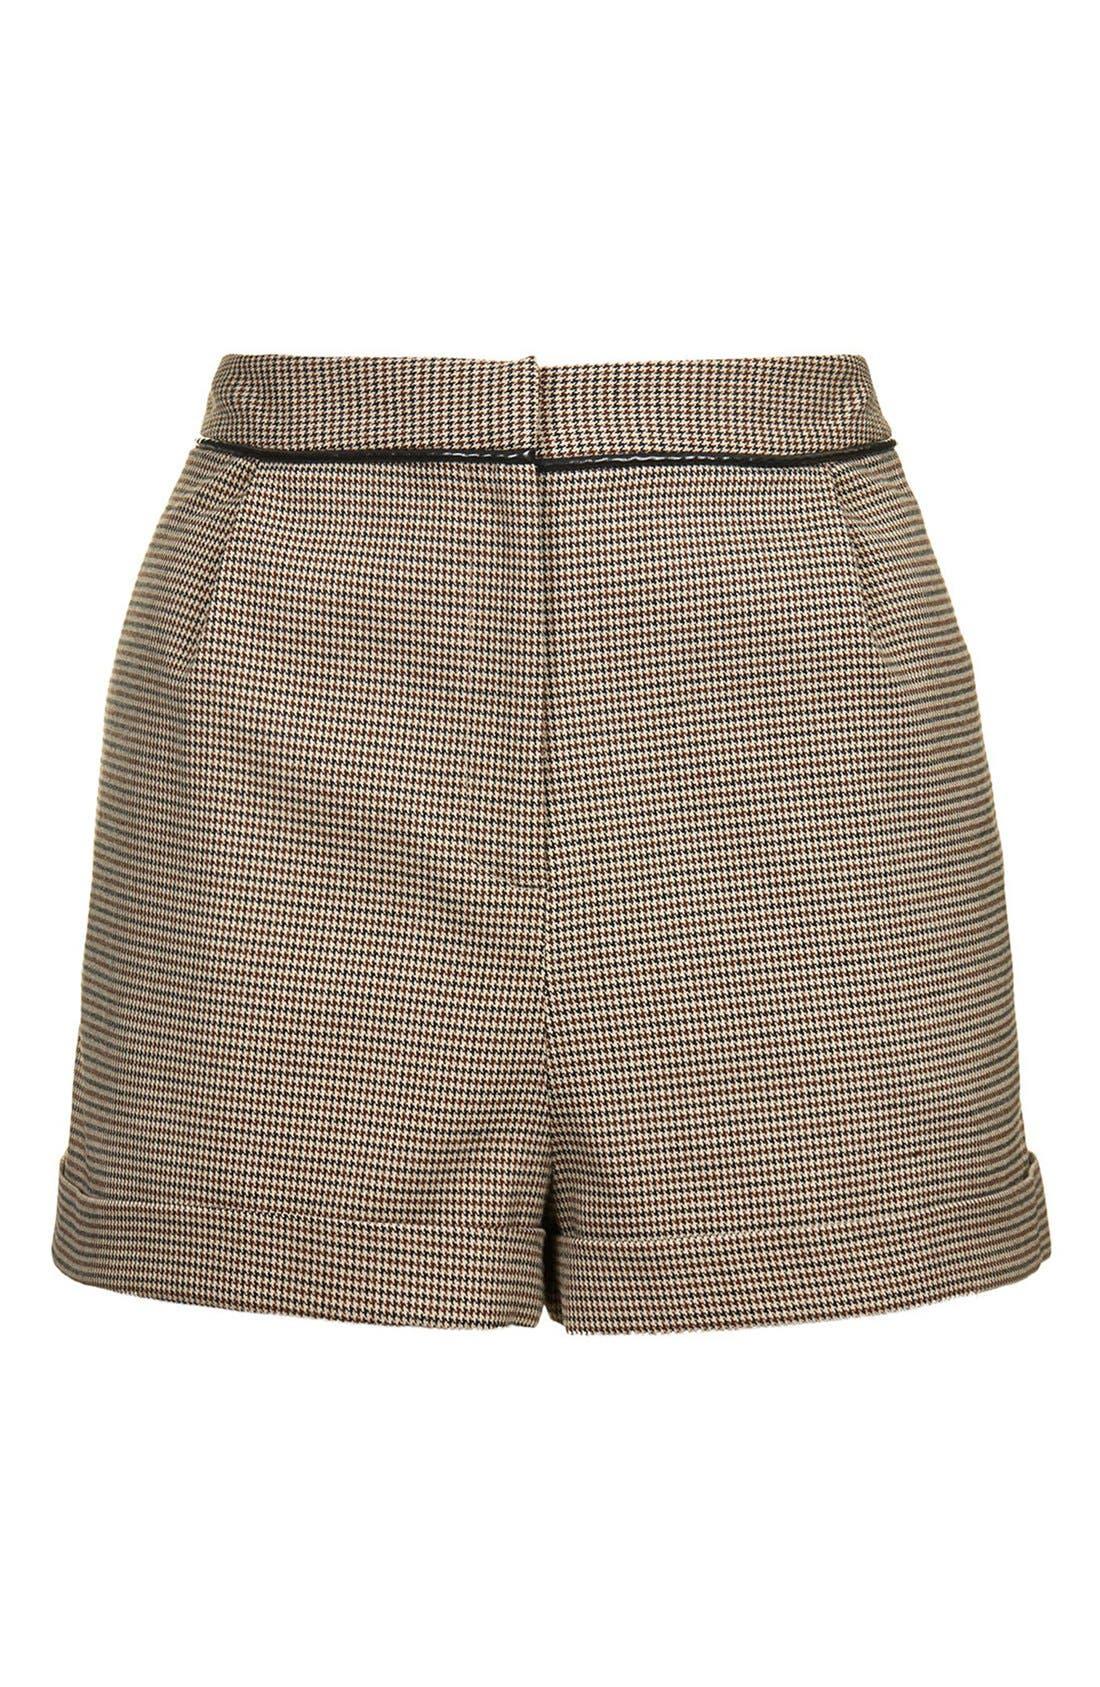 Alternate Image 3  - Topshop Check Mini Shorts